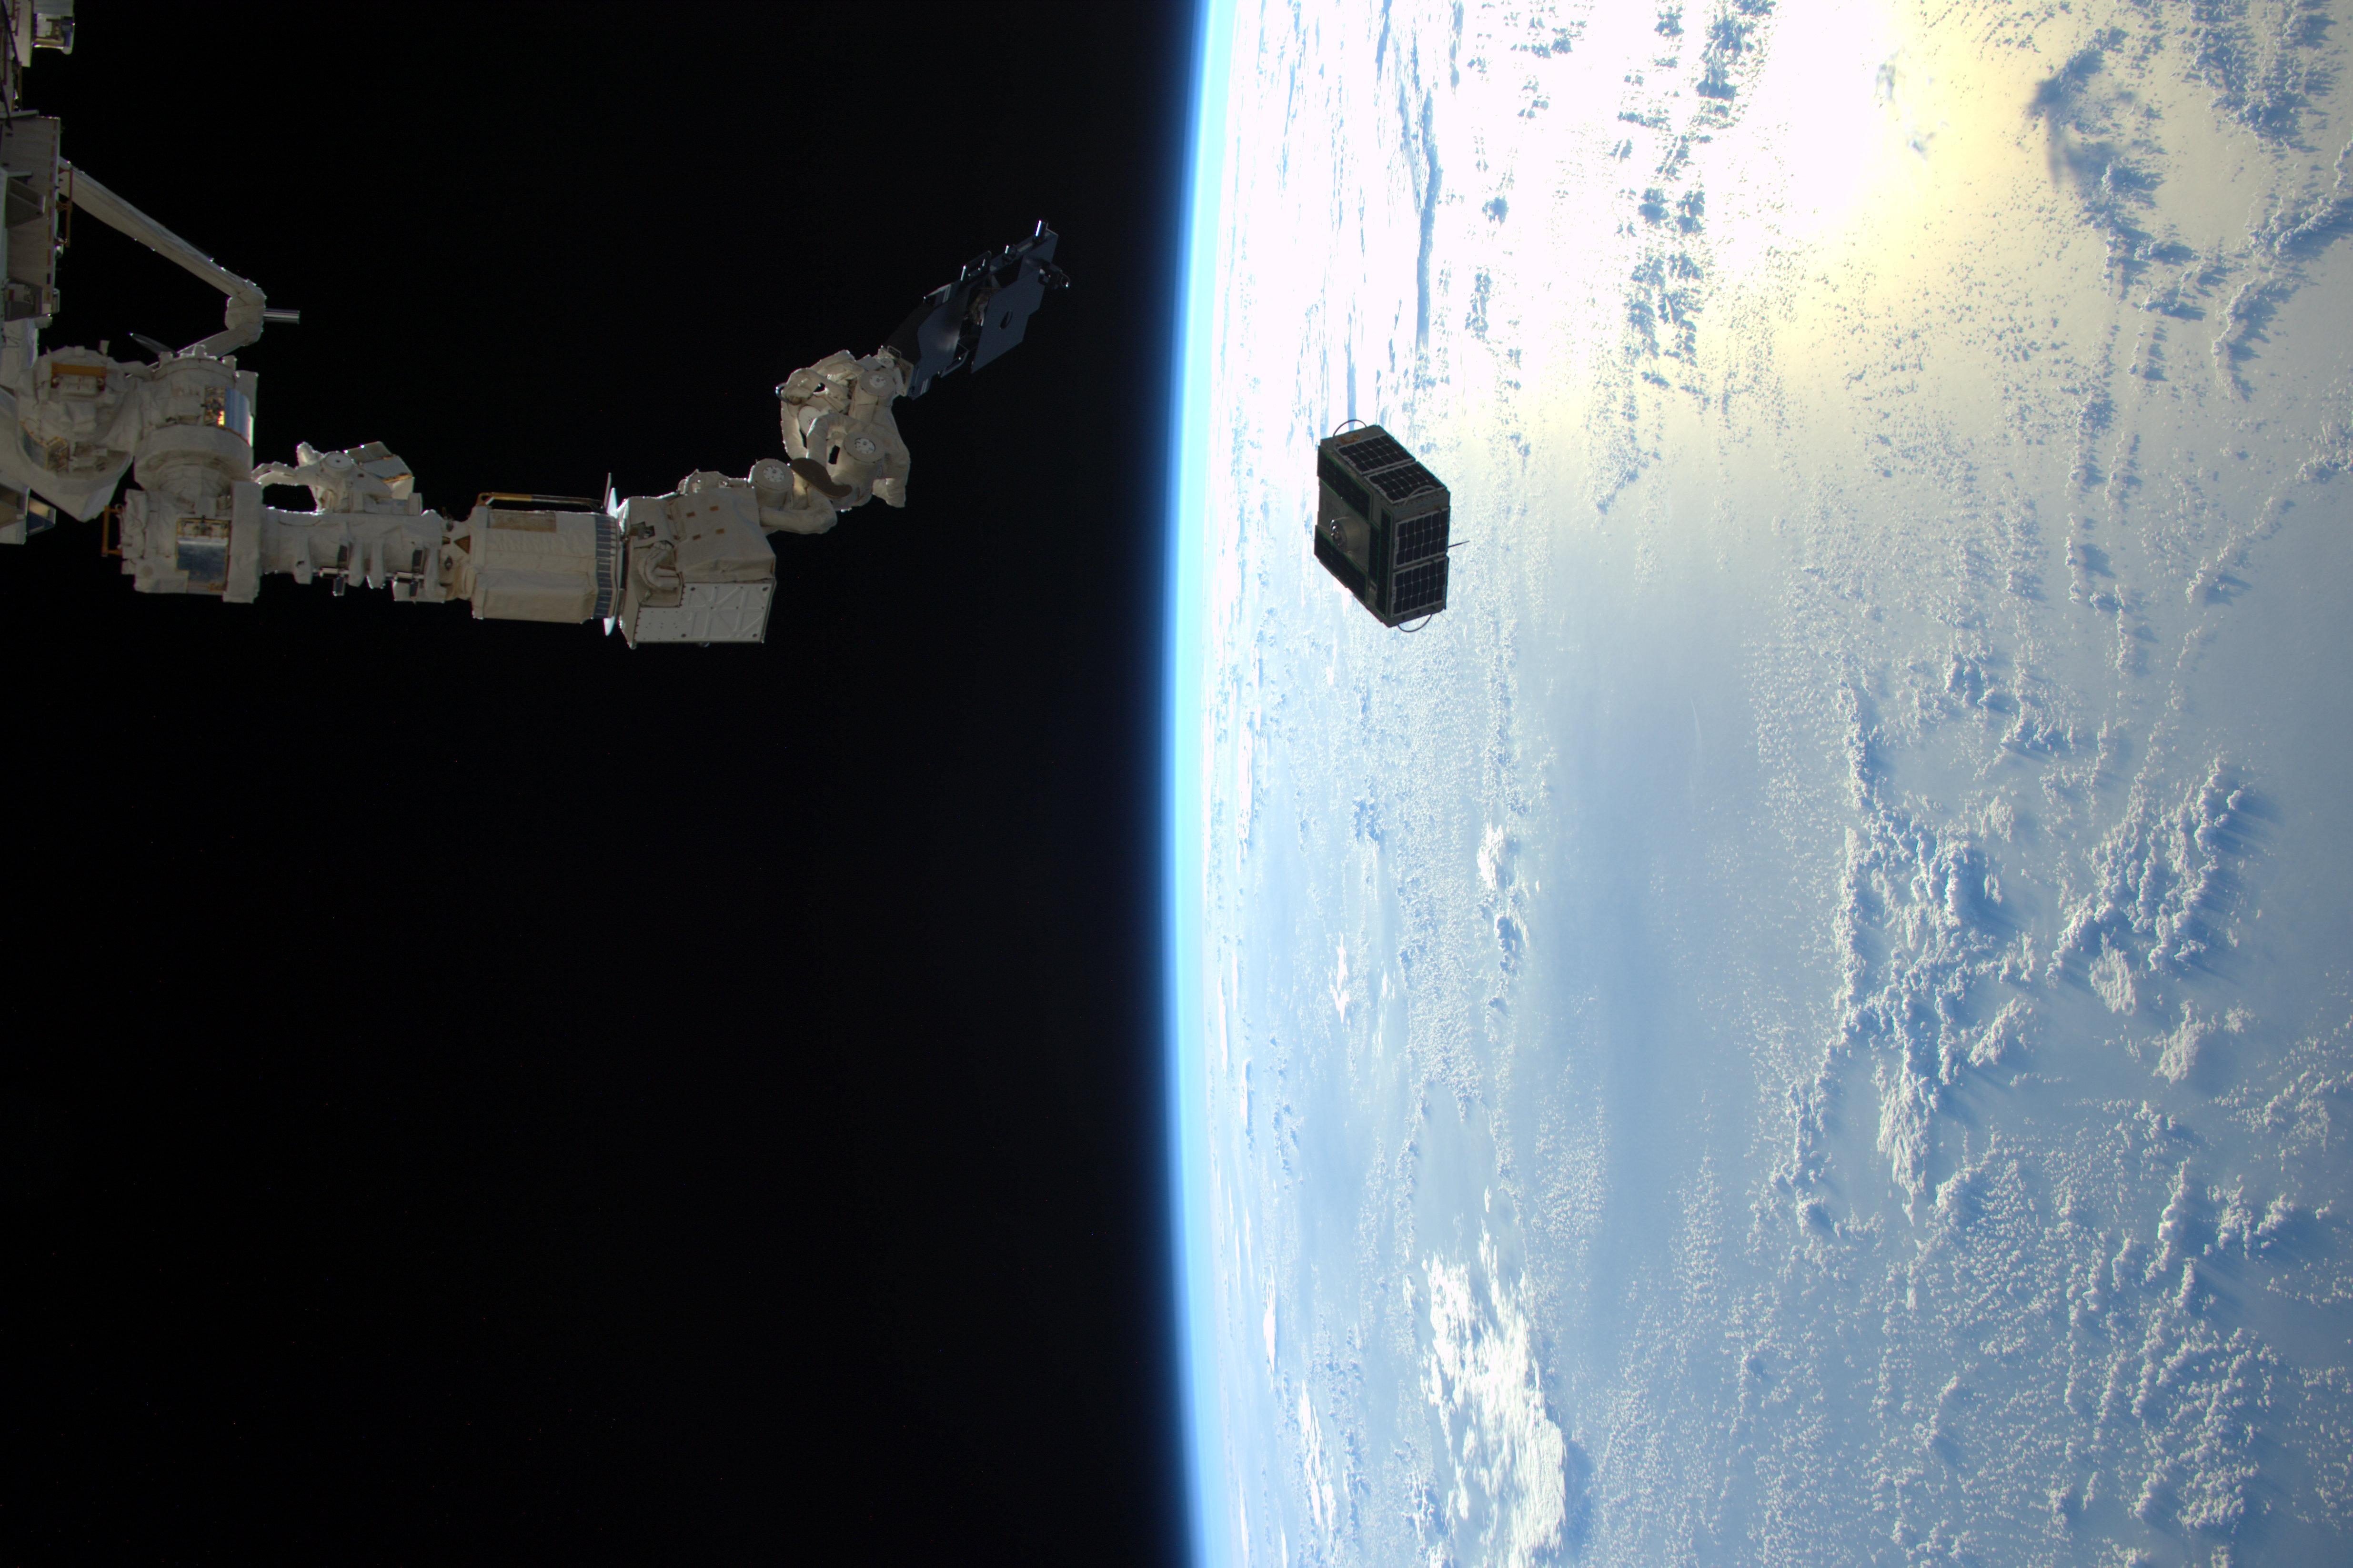 nasa visible satellite - photo #5